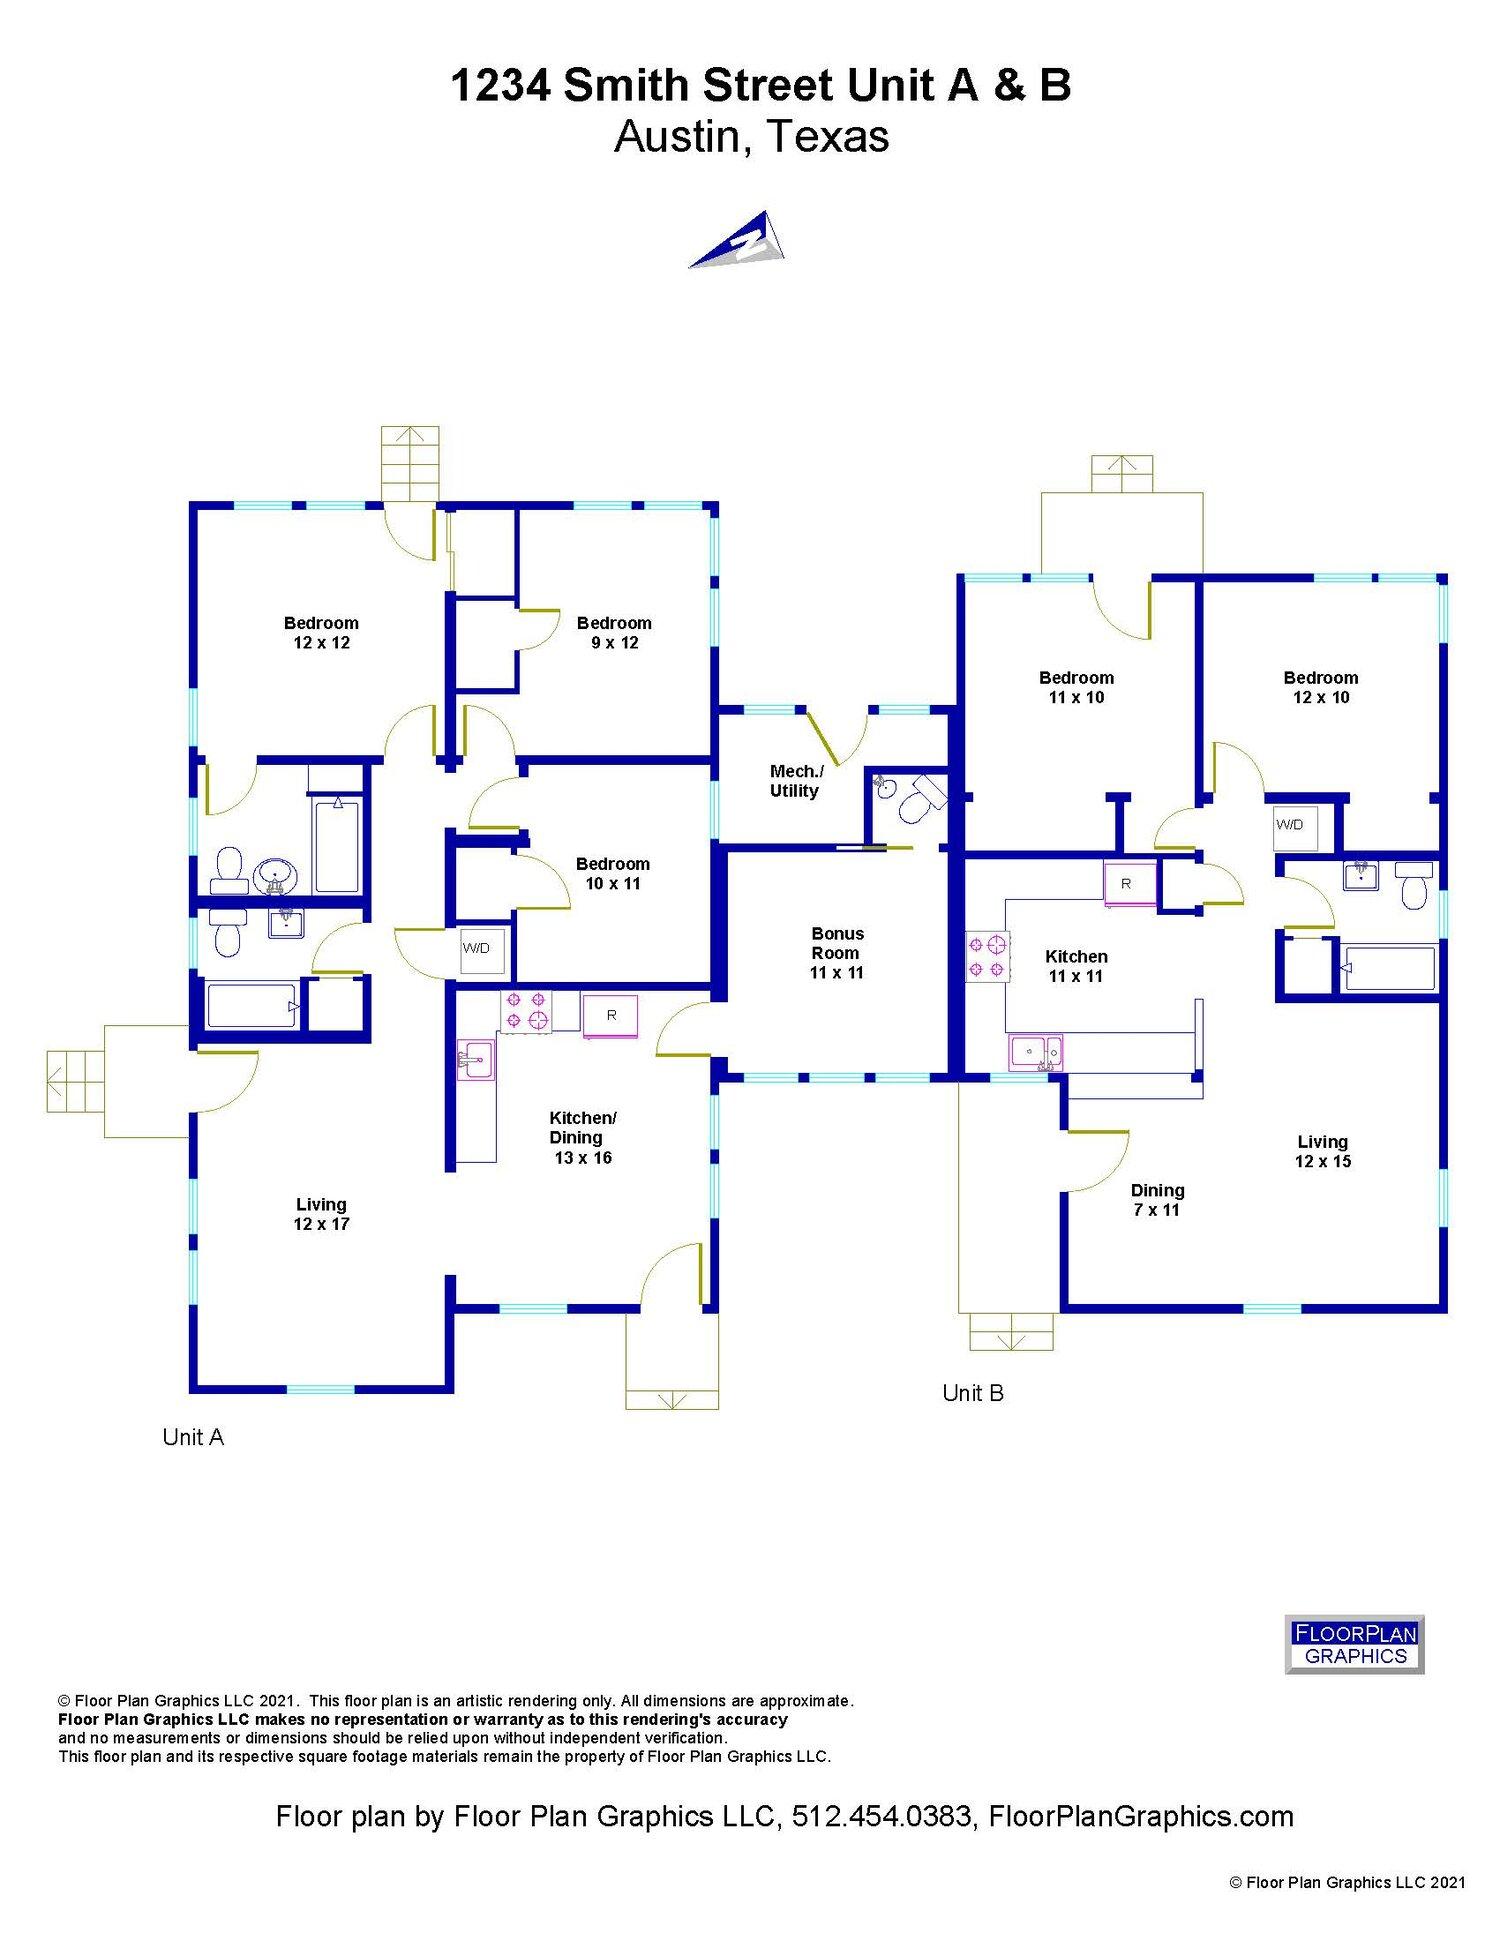 Marketing Package Duplex Triplex Fourplex And Apartments Floor Plan Graphics